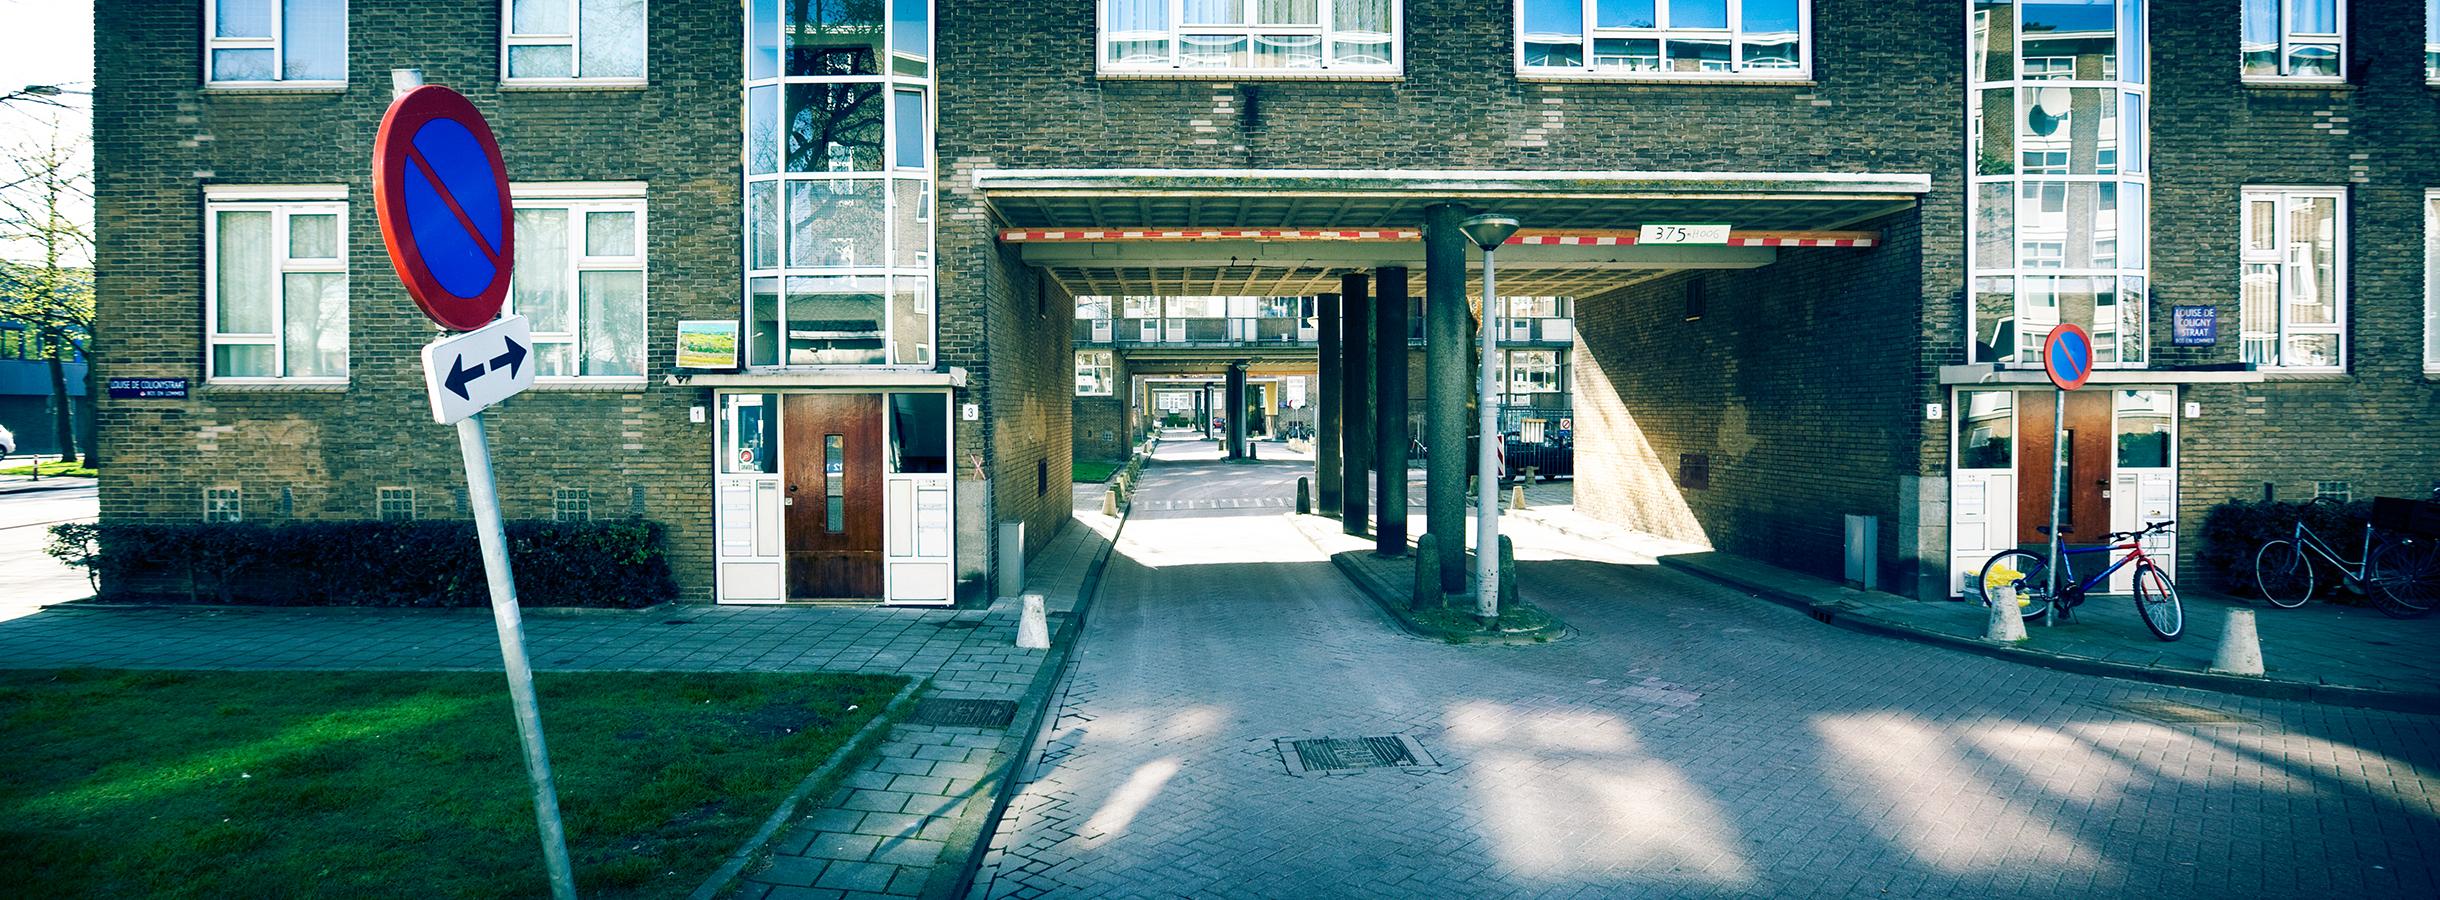 SvhL-Amsterdam-03.jpg